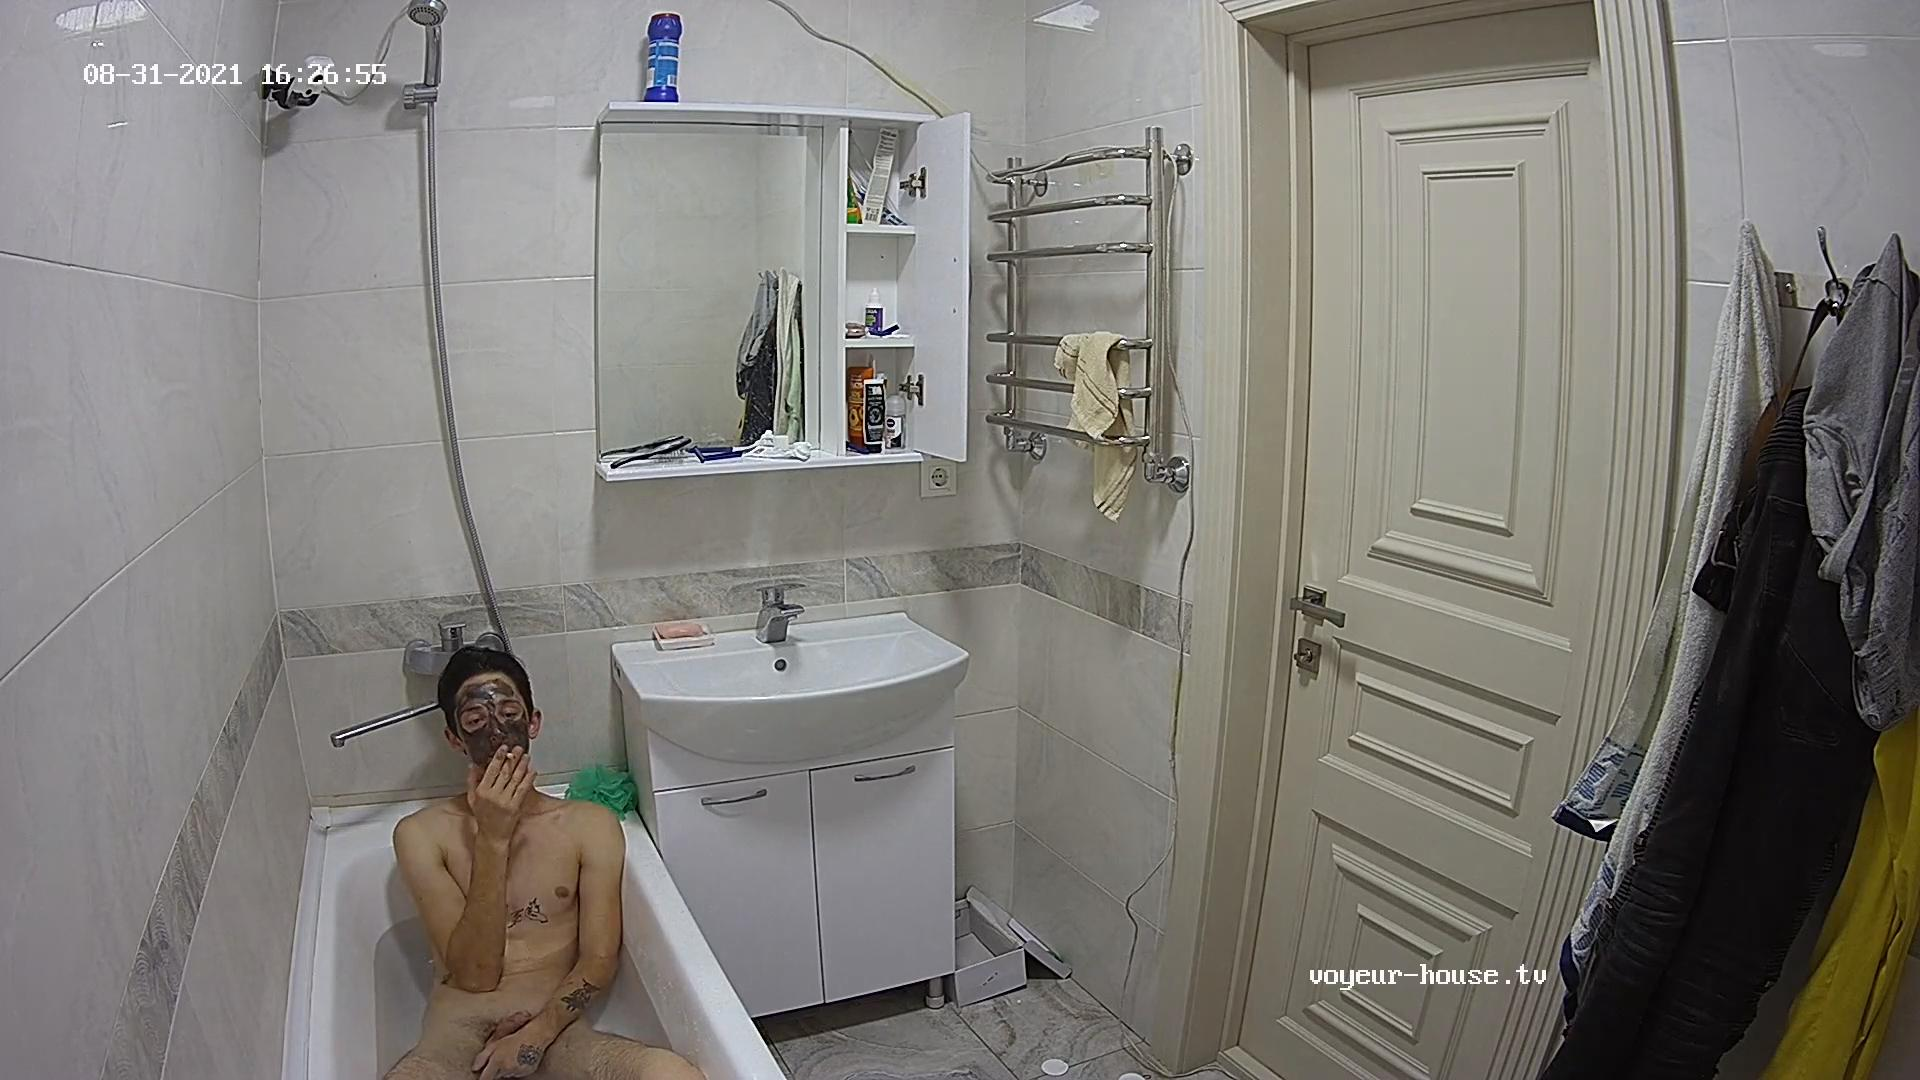 Bango jerking off in the bath 31 Aug 2021 cam 2